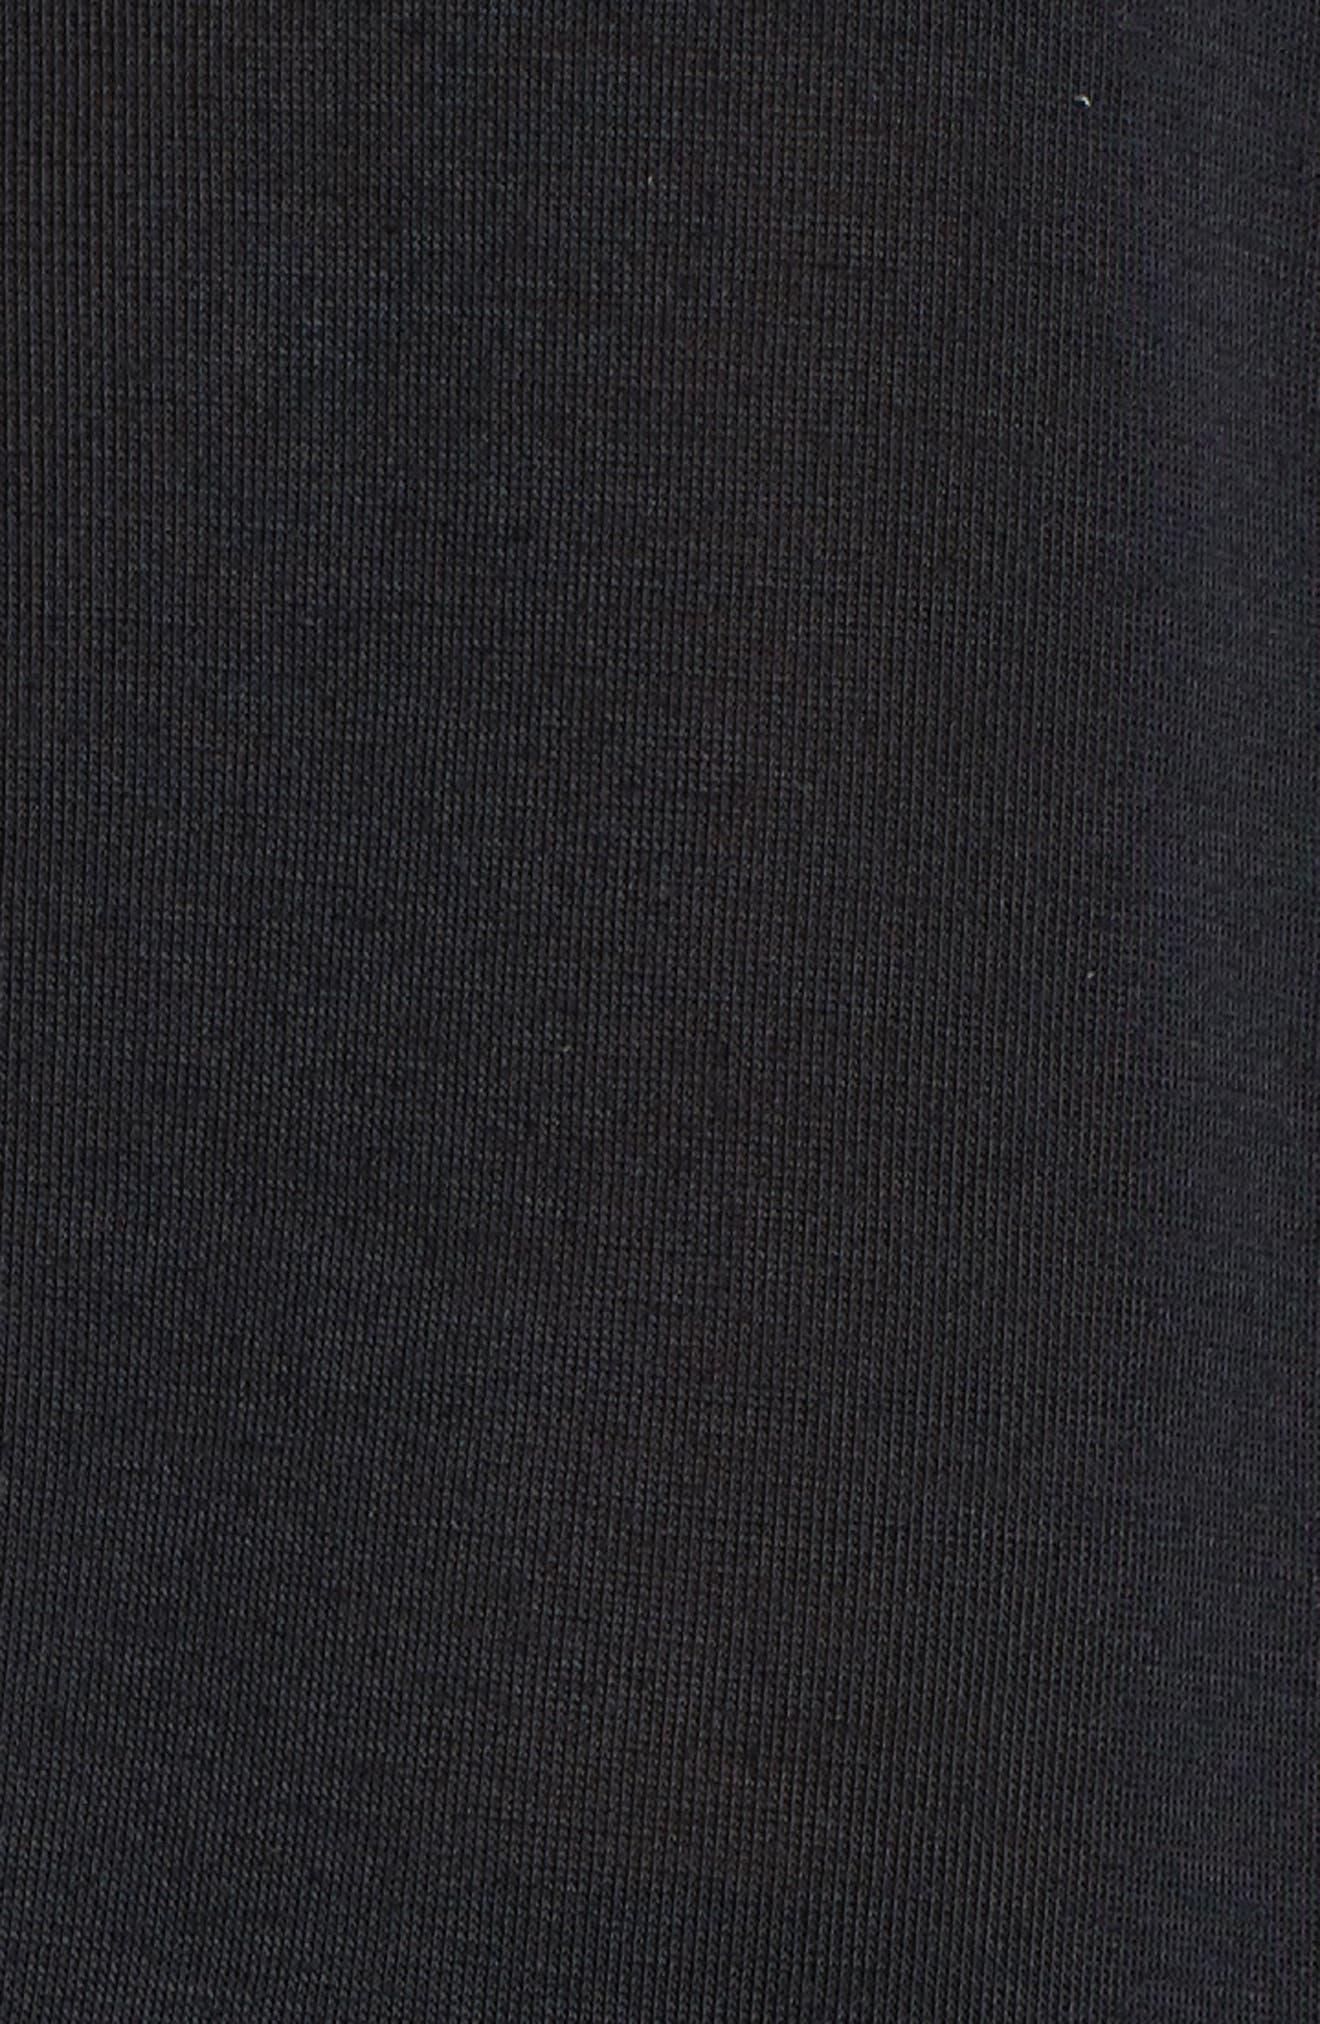 Threadborne Fashion Tank,                             Alternate thumbnail 6, color,                             Black